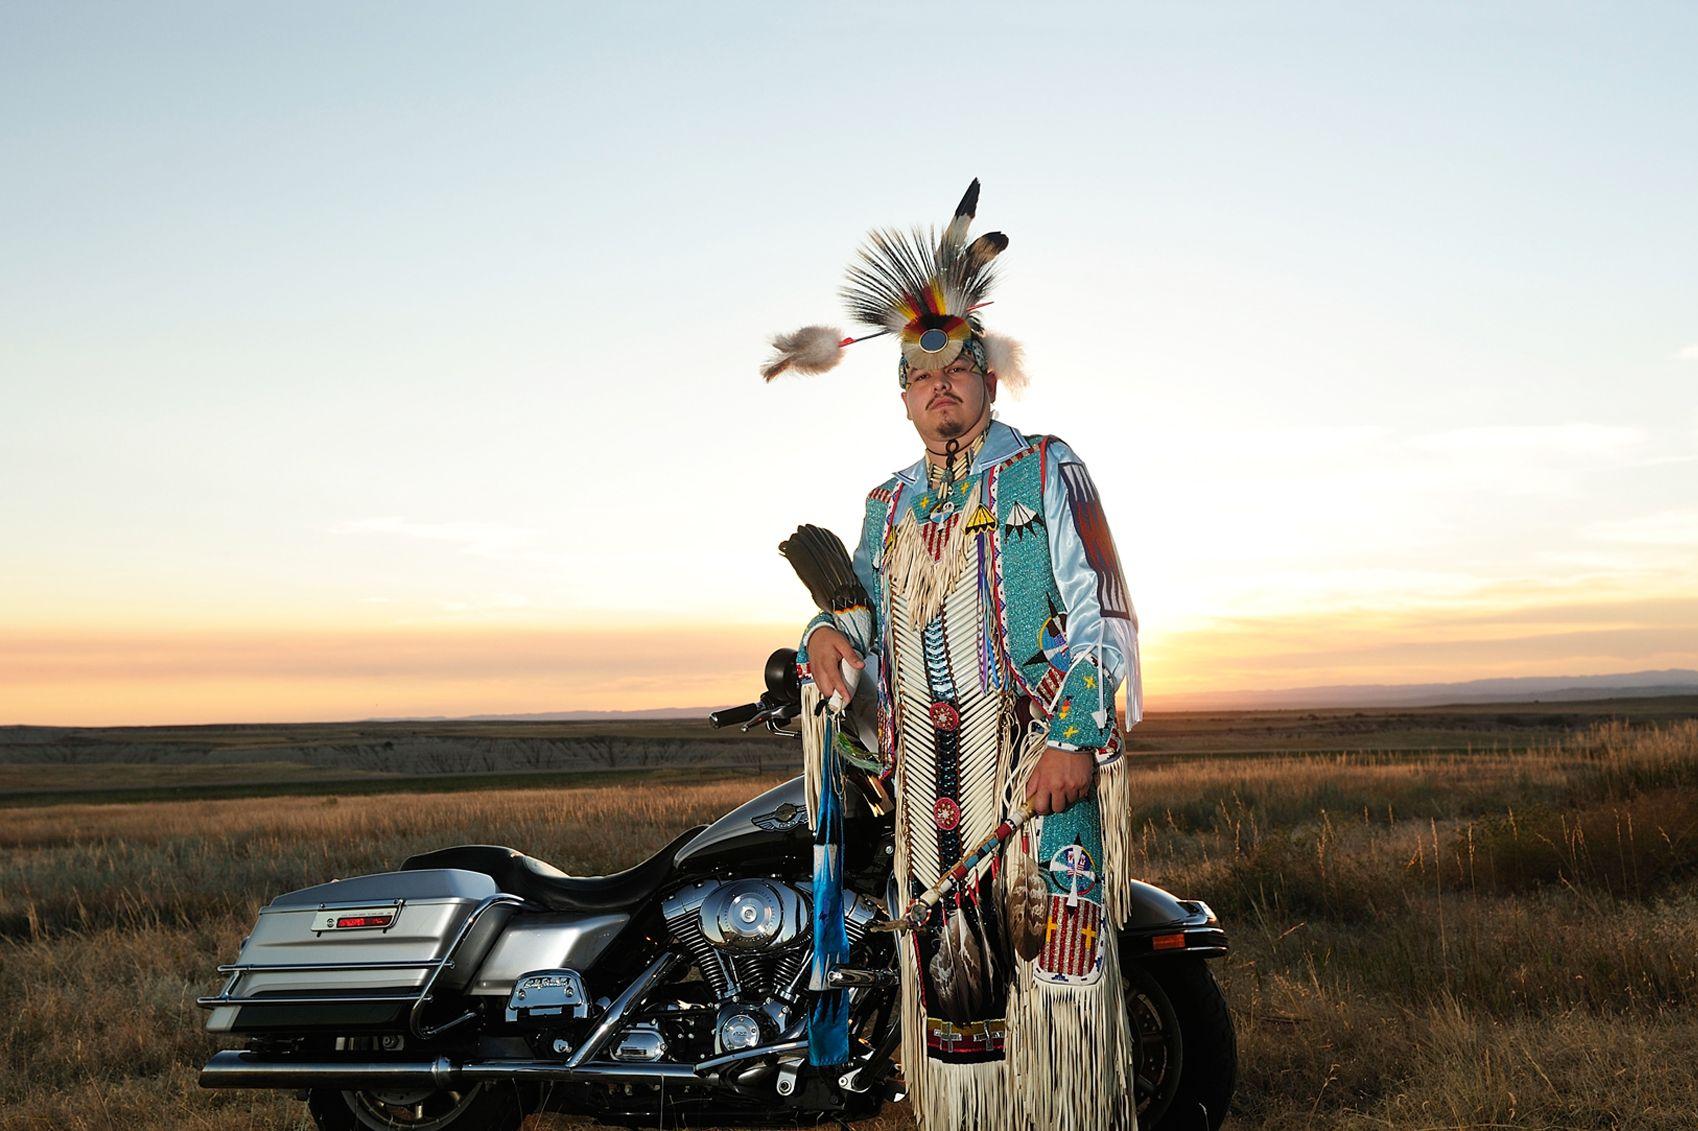 Meet Stephen Yellowhawk Keeping His Native American